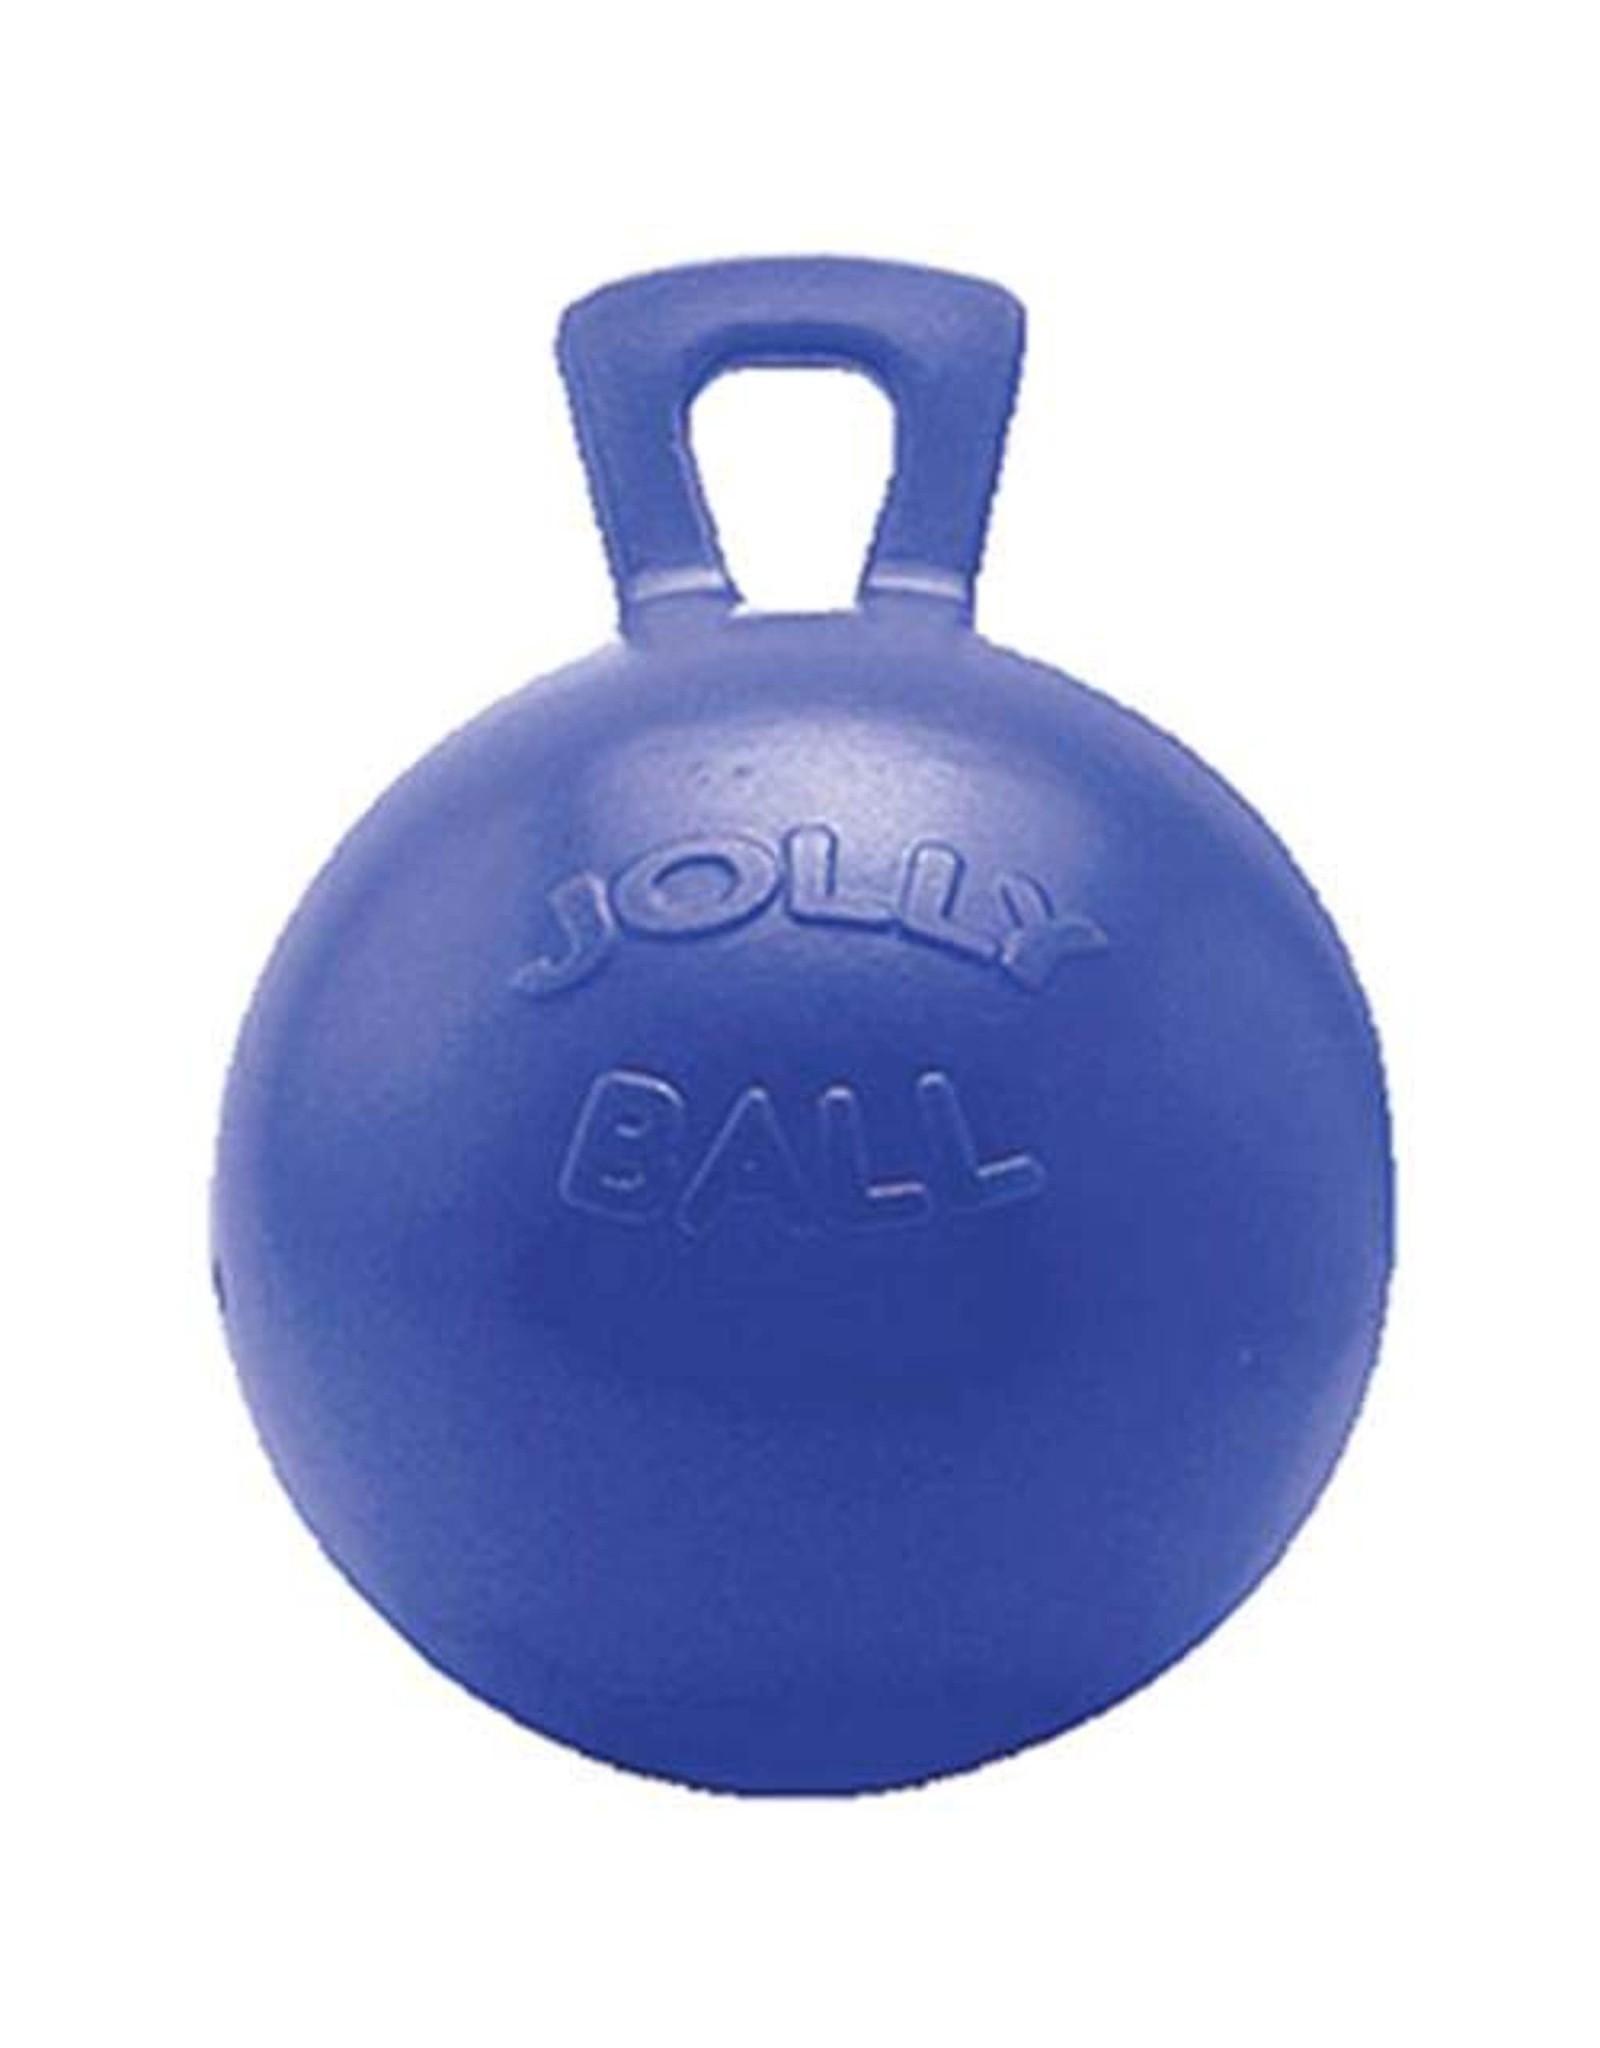 Horseman's Pride Jolly Ball